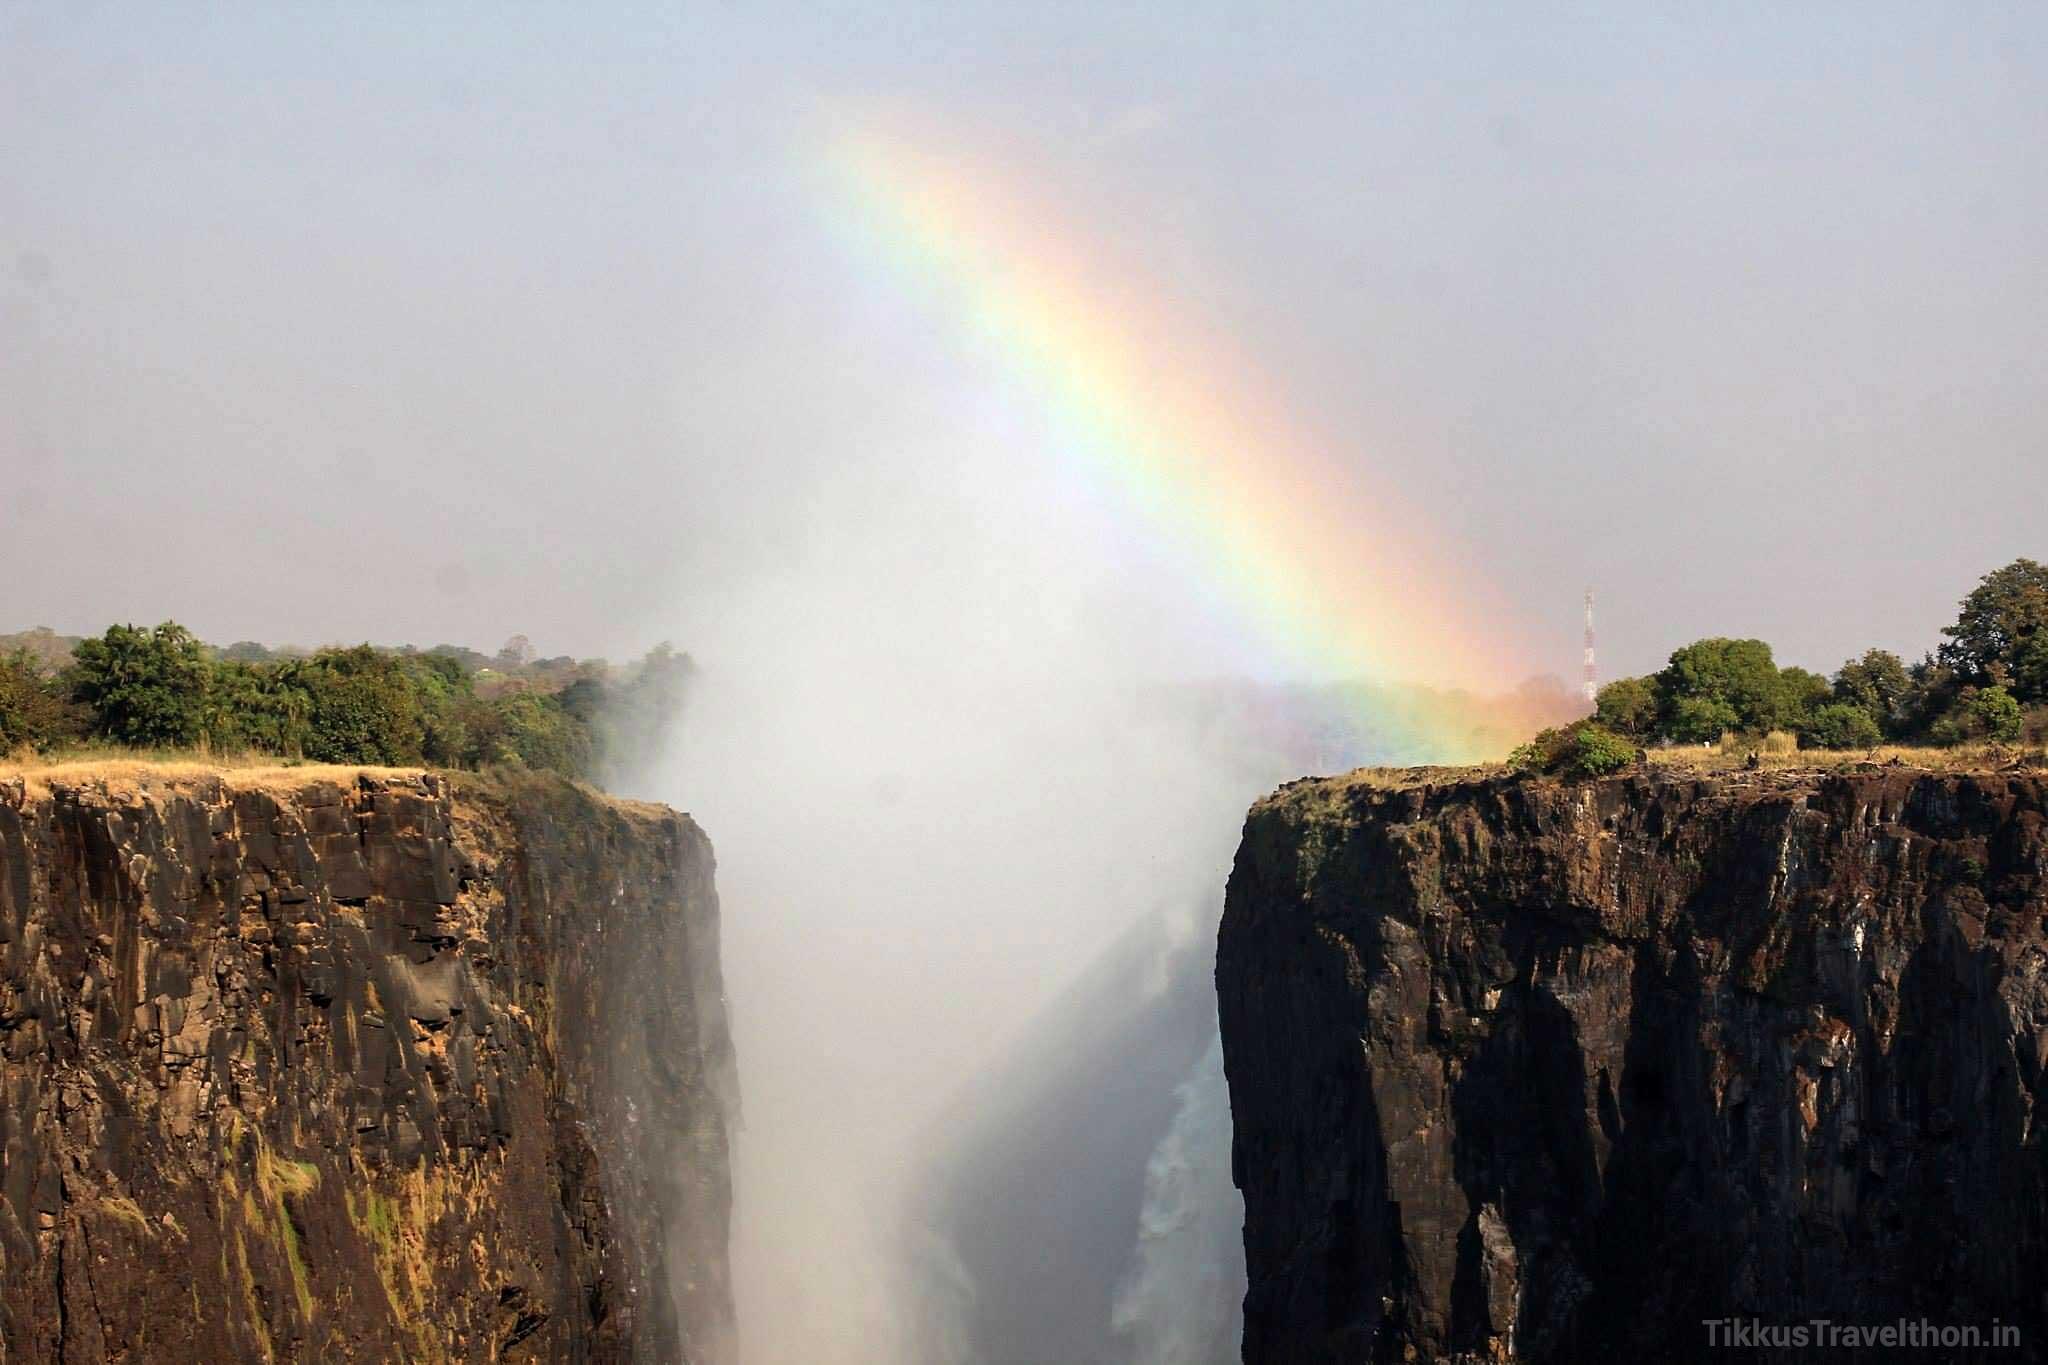 The Rainbow at the Falls of Victoria - Livingstone, Zambia